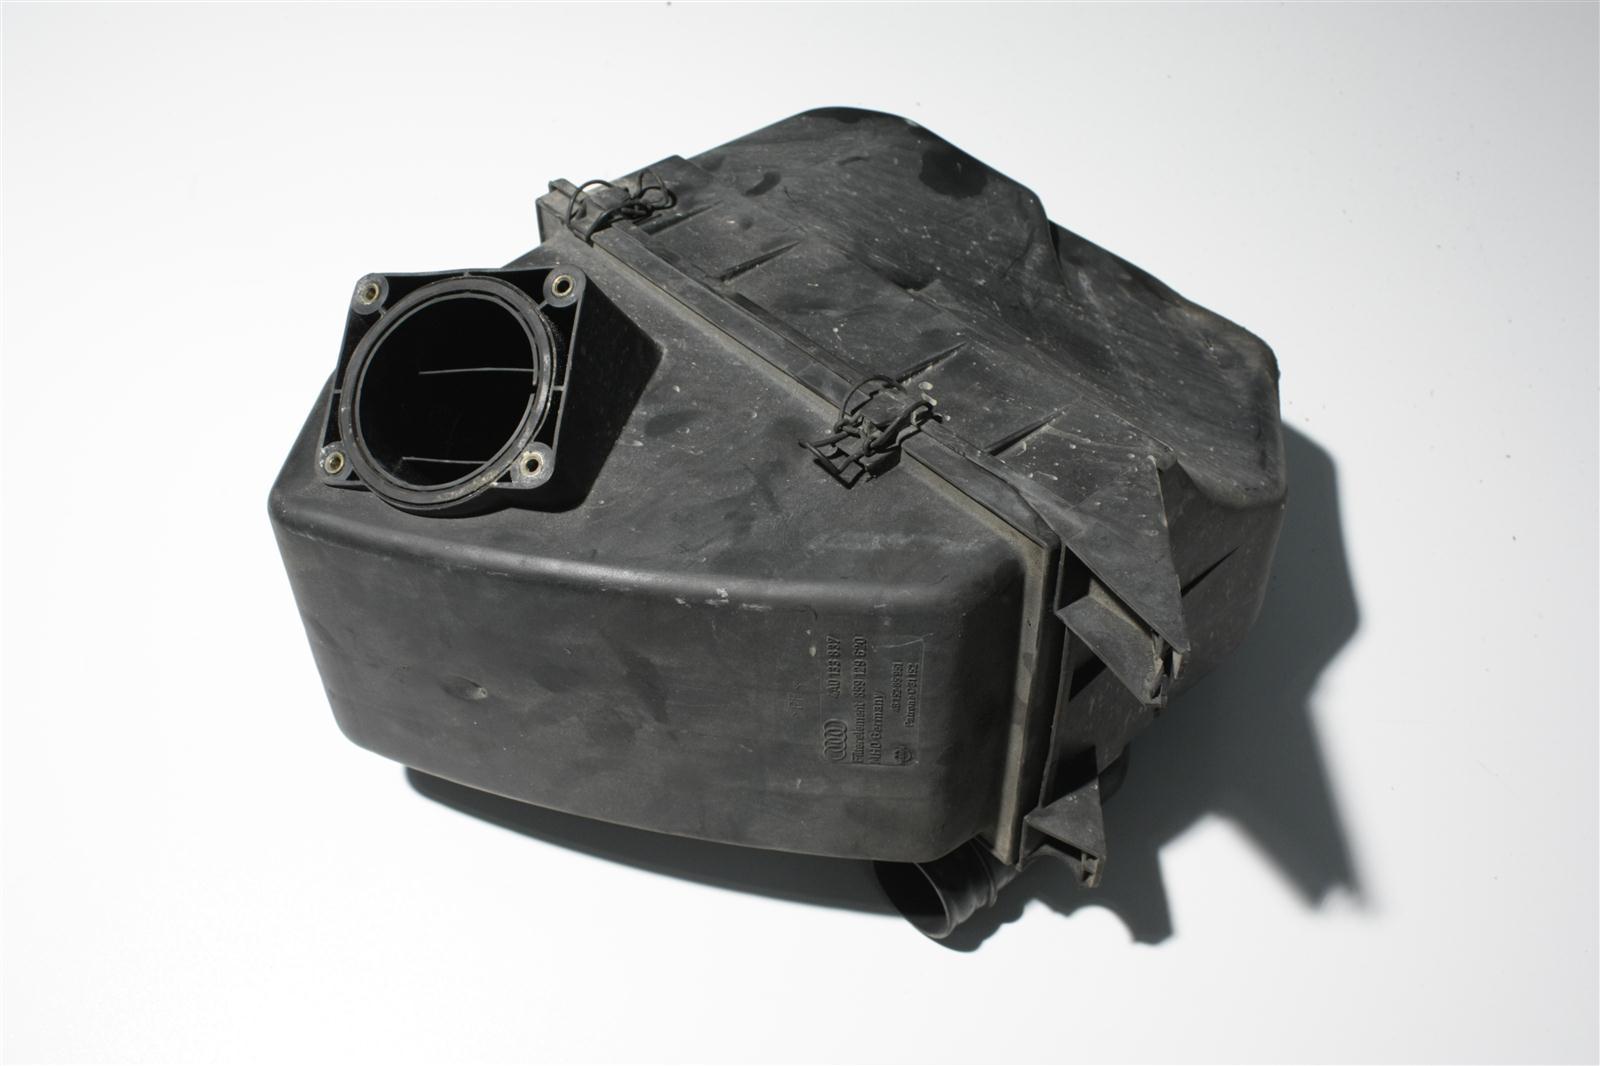 Audi 100/A6 C4 2.8l AAH Luftfilter 4A0133837